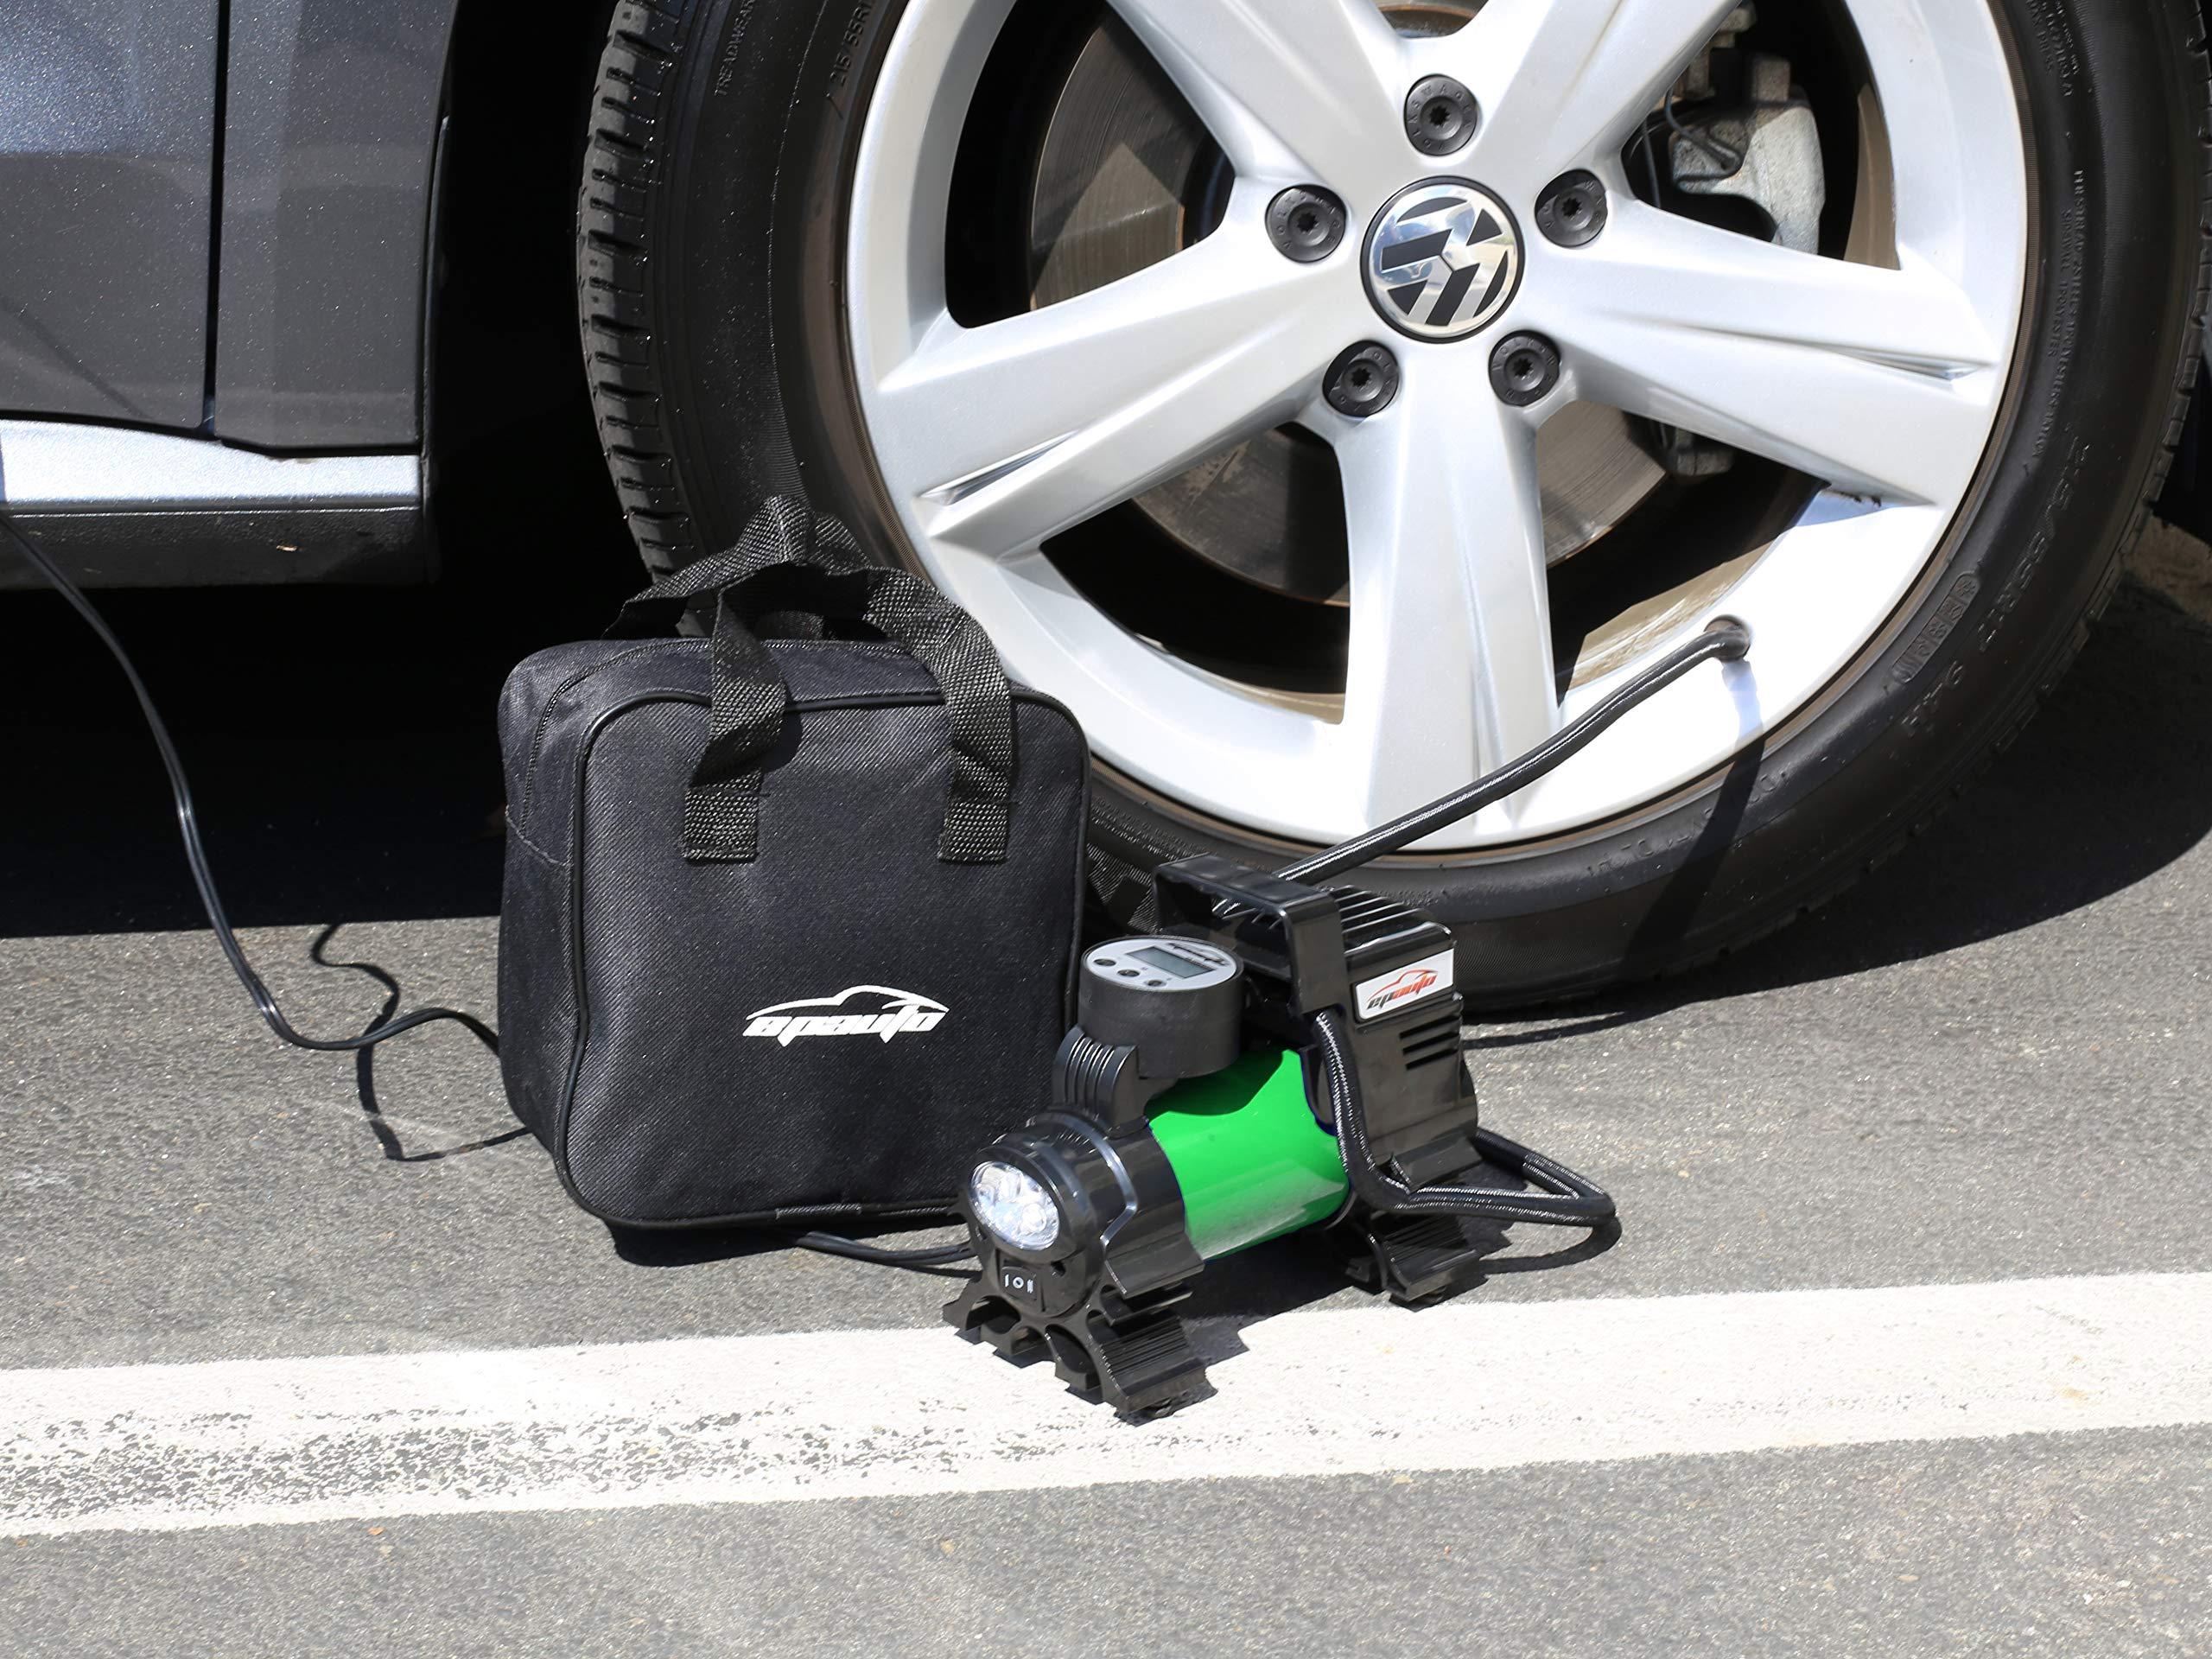 EPAuto 12V DC Portable Air Compressor Pump, Digital Tire Inflator by EPAuto (Image #3)